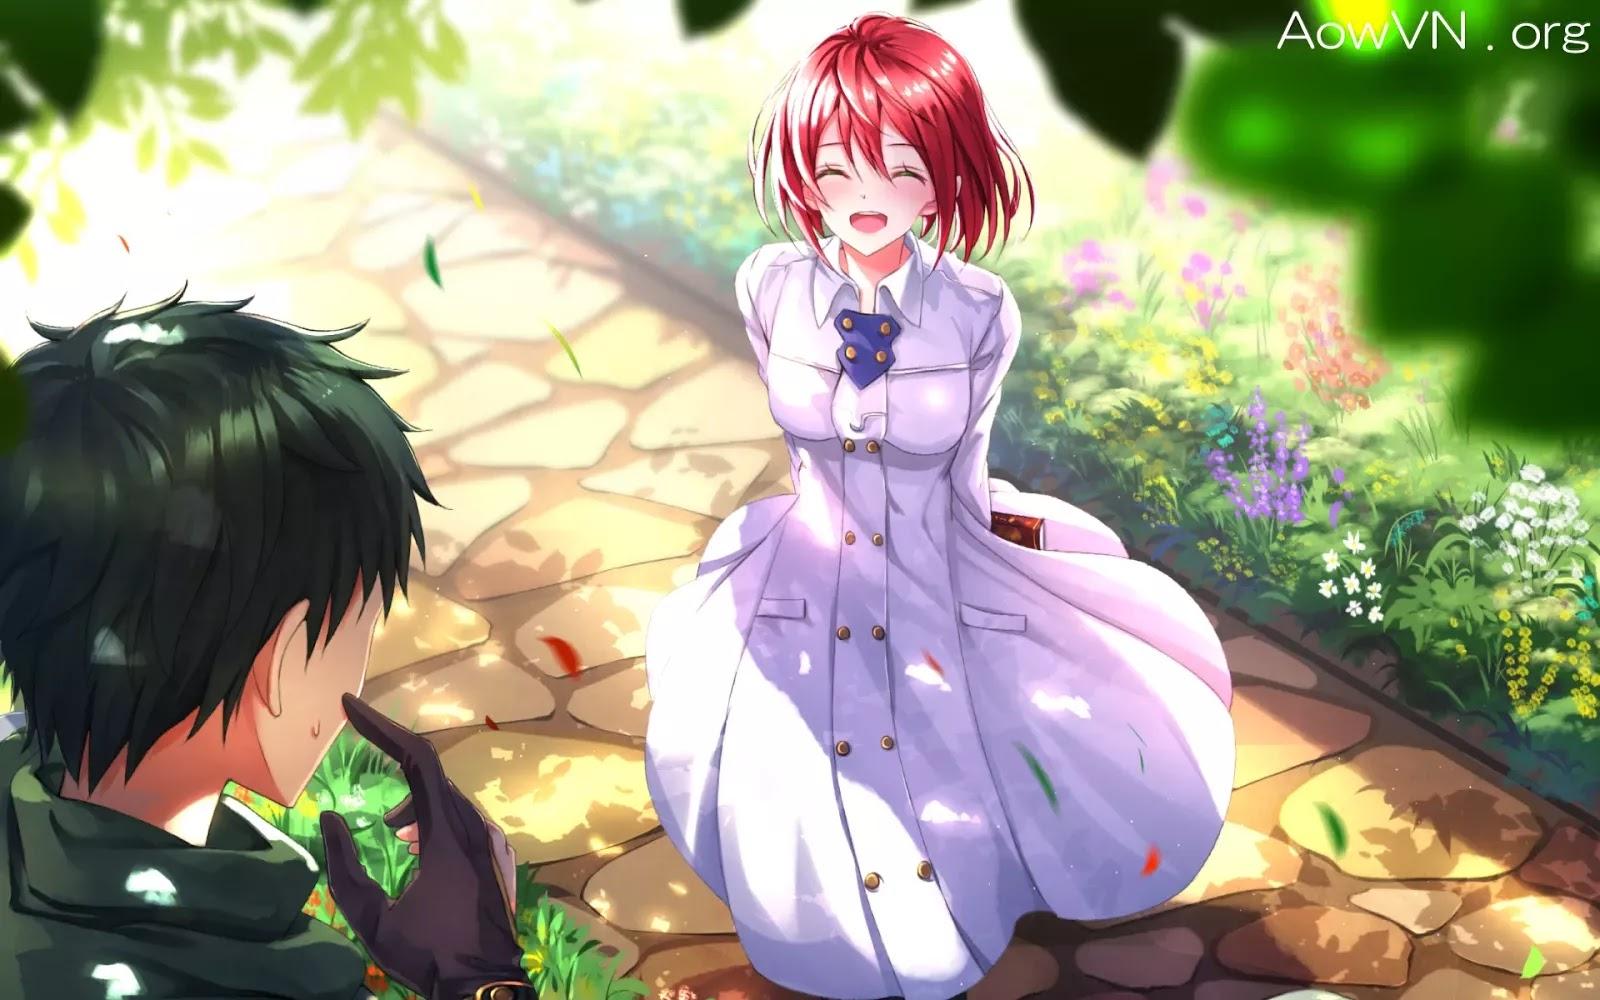 AowVN m%2B%25281%2529 - [ Anime 3gp Mp4 ] Akagami no Shirayukihime SS1 + SS2 + OVA | Vietsub